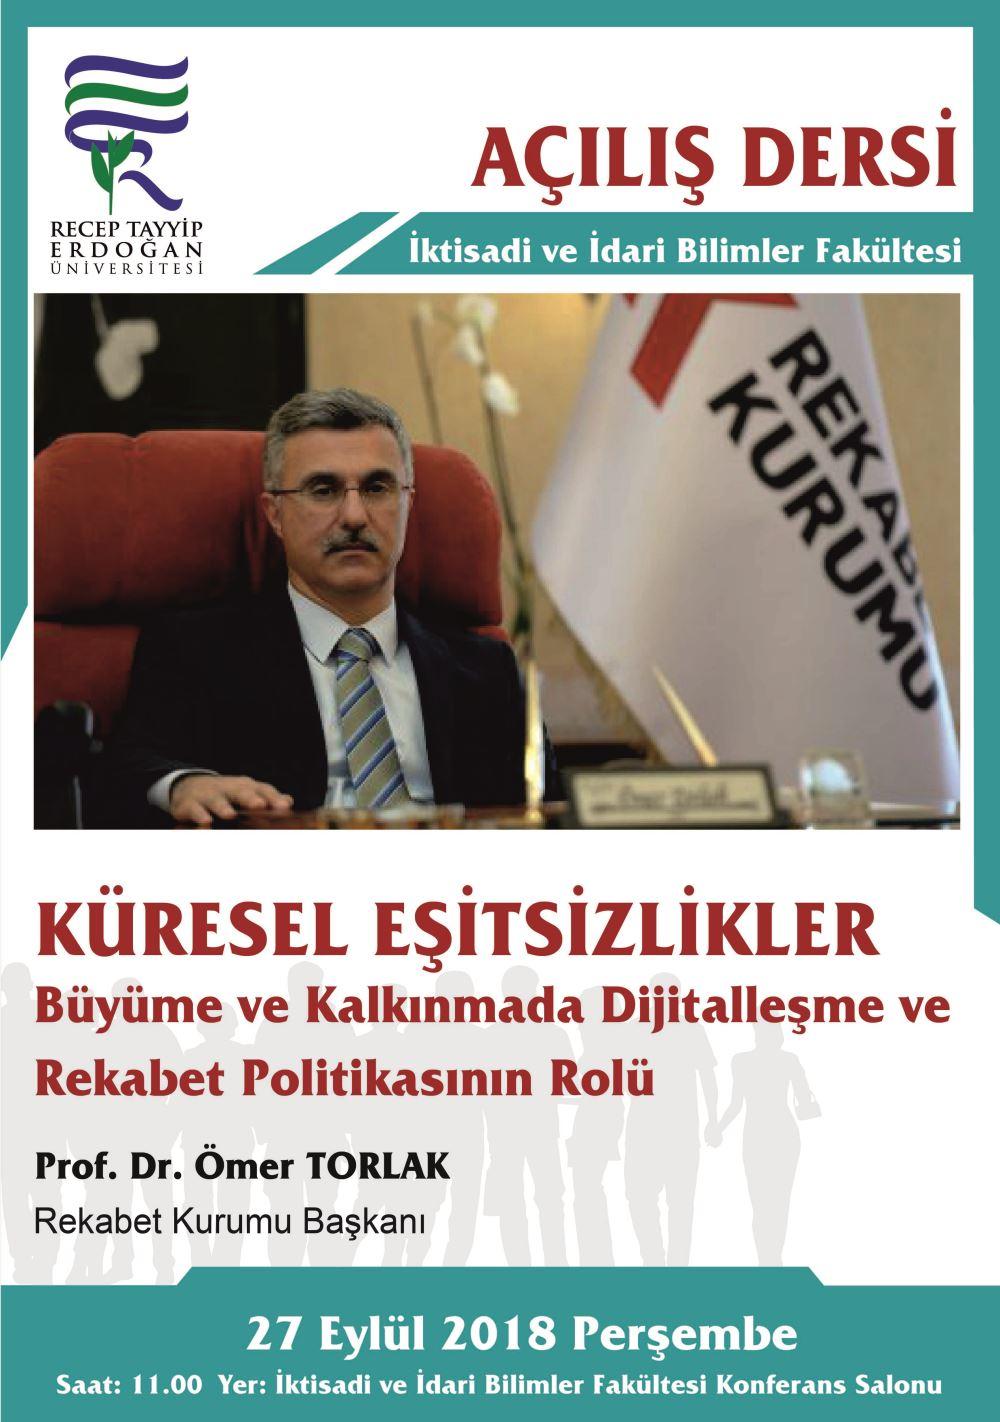 Açılış Dersi - Prof. Dr. Ömer TORLAK